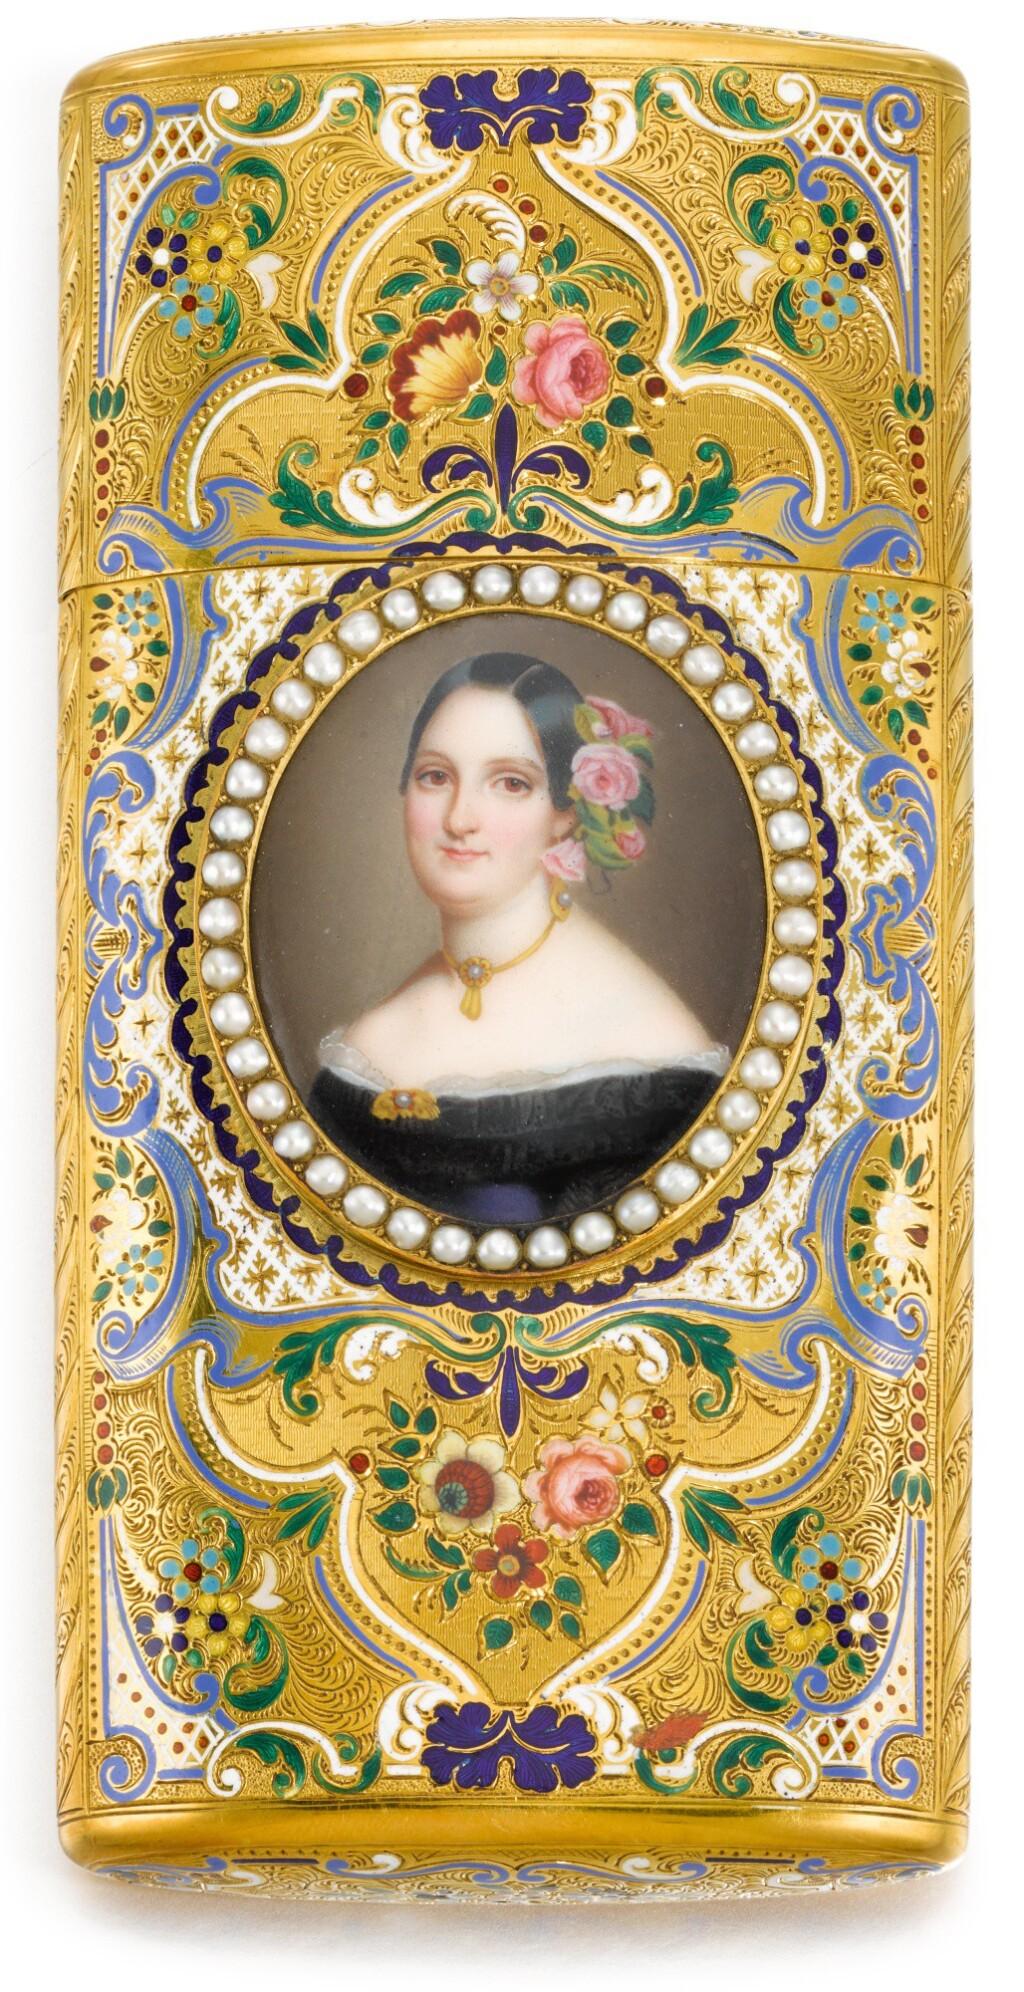 A GOLD AND ENAMEL CIGAR CASE WITH PEARL-FRAMED ENAMEL MINIATURE, GENEVA, CIRCA 1850